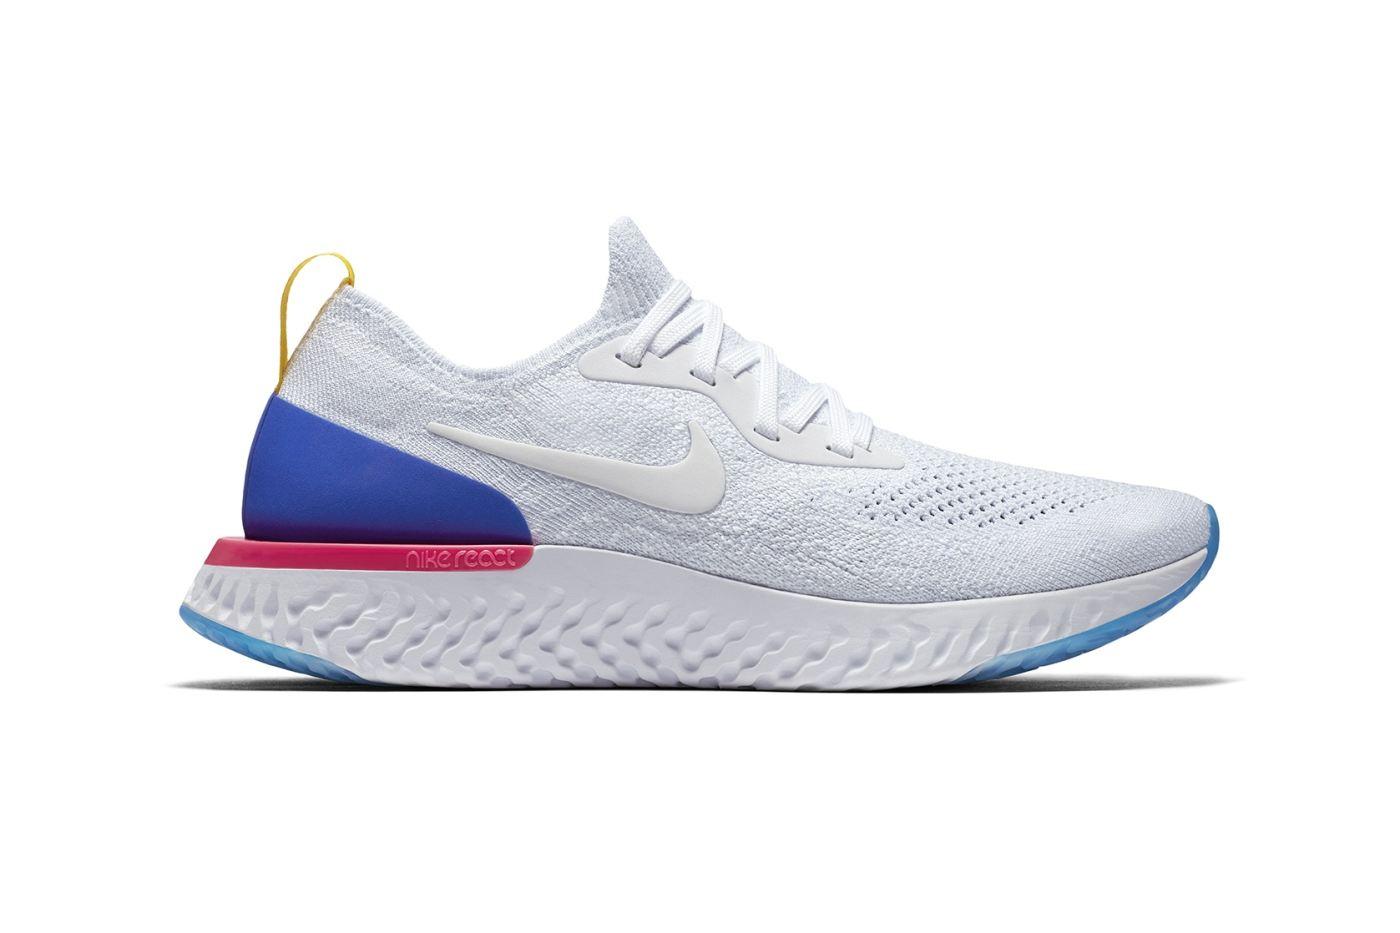 9802e44f1b4 Tênis de corrida novo na área  Nike Epic React Flyknit –  correpaula